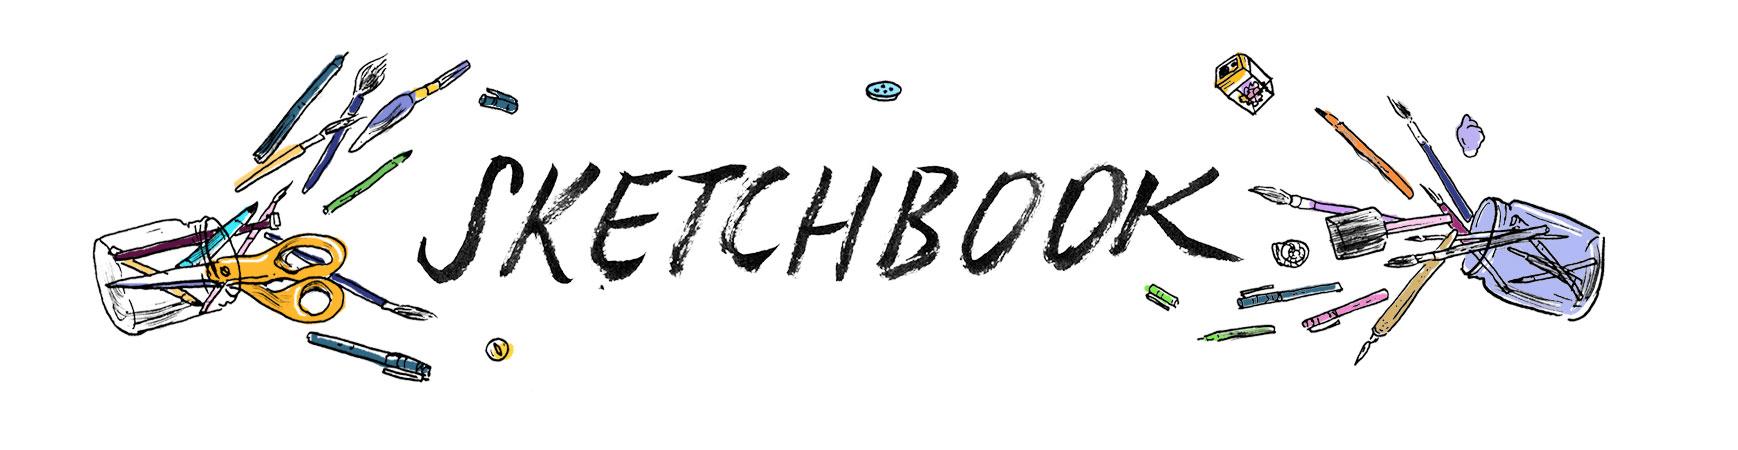 sketchbook-banner4.jpg